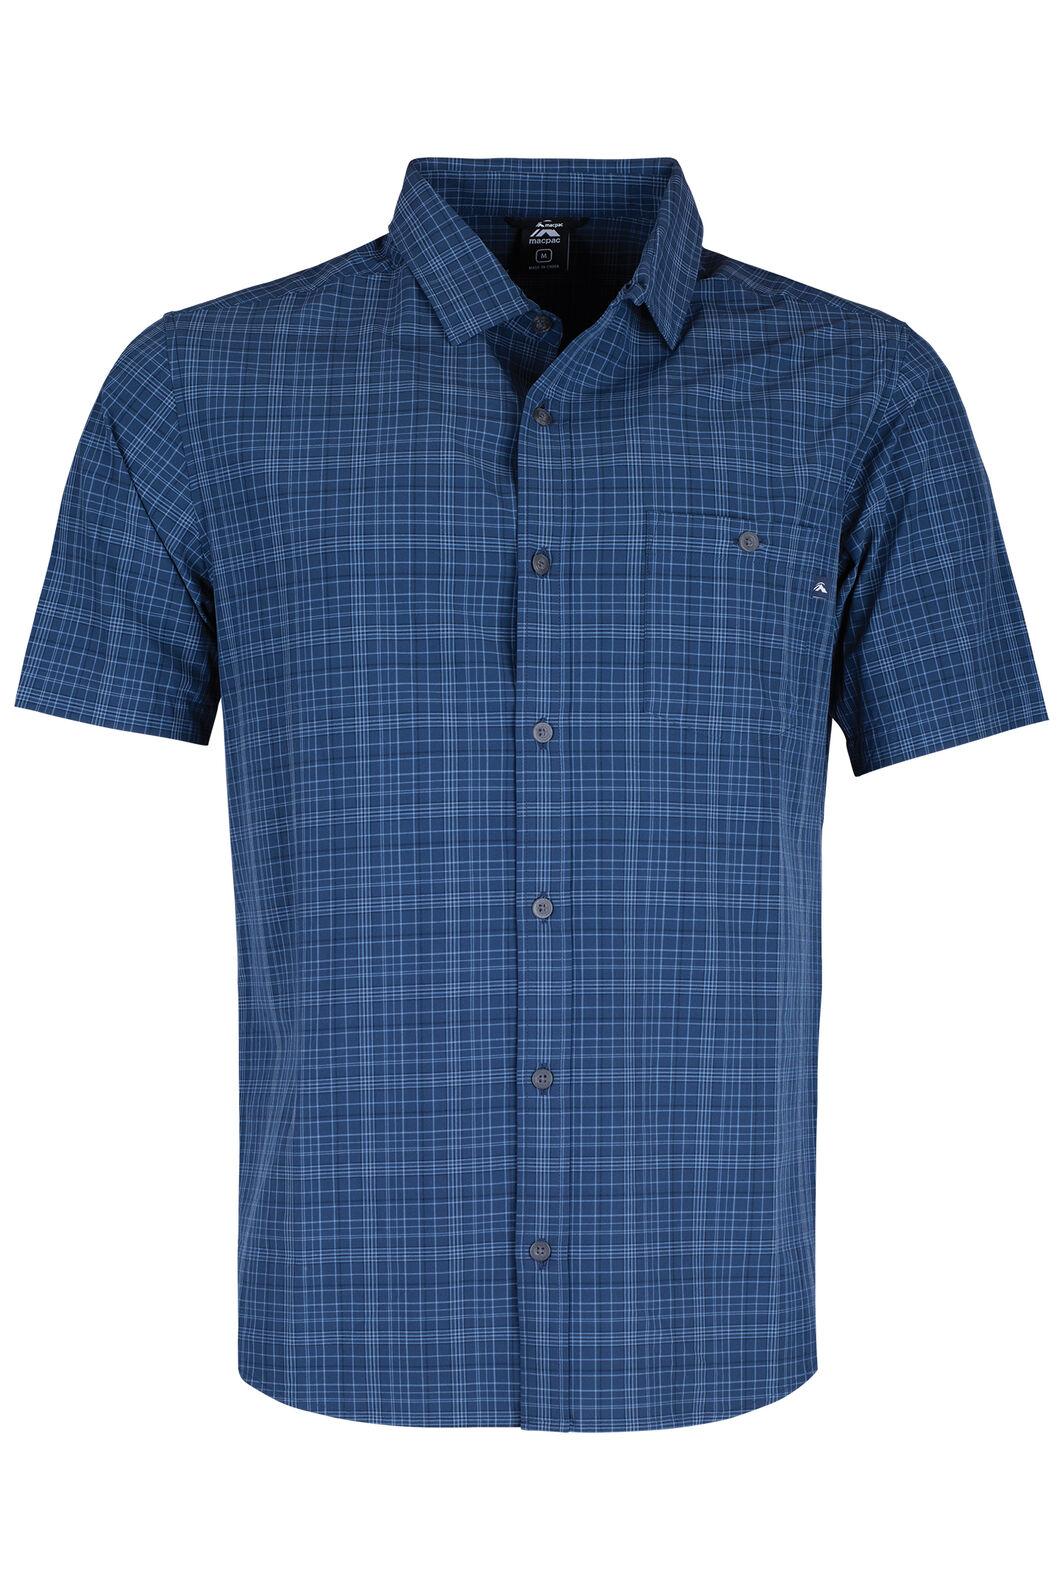 Macpac Travel Lite Short Sleeve Shirt - Men's, Black Iris Check, hi-res